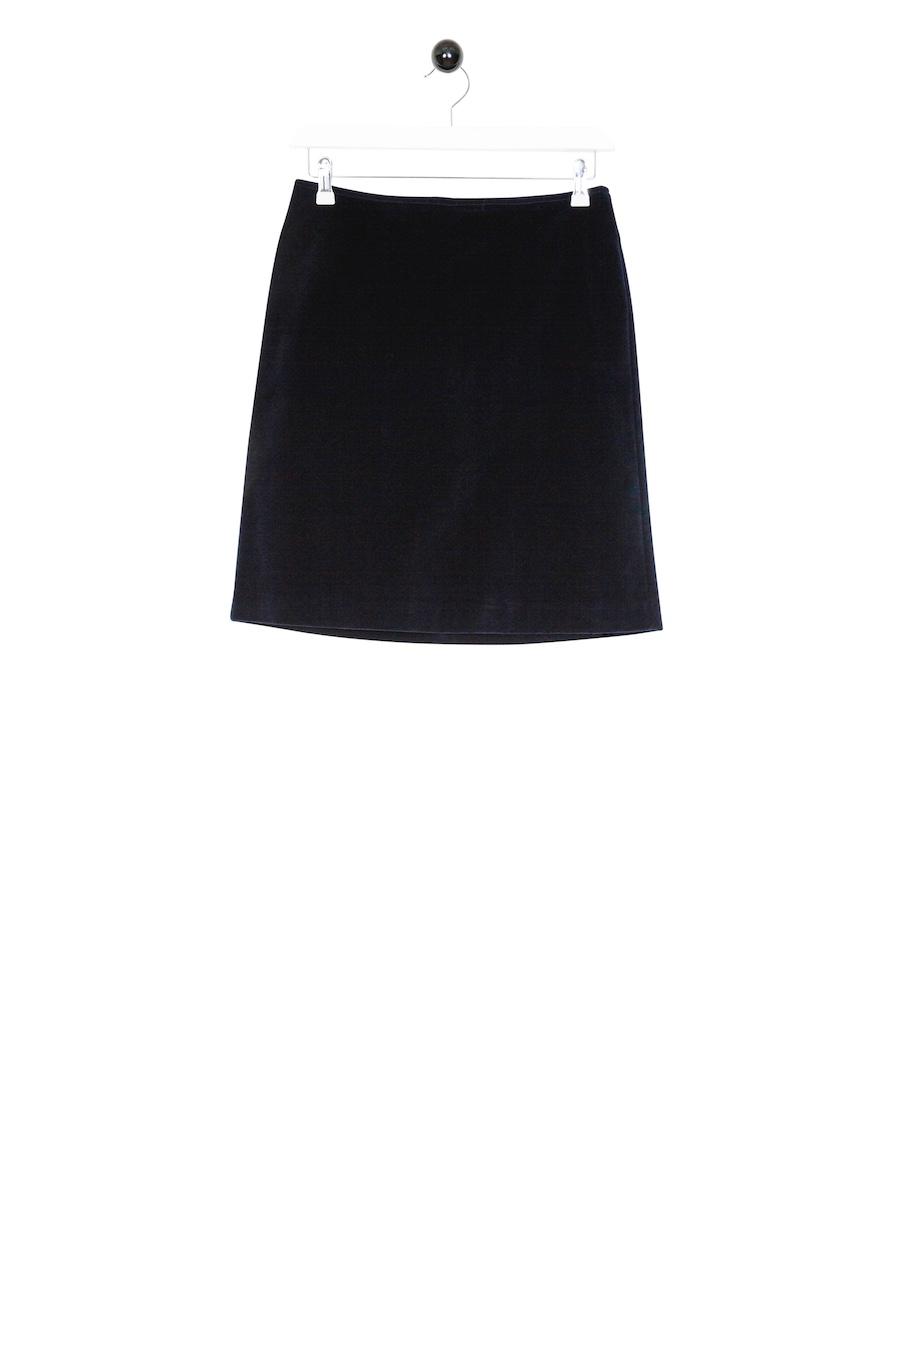 Shian Skirt